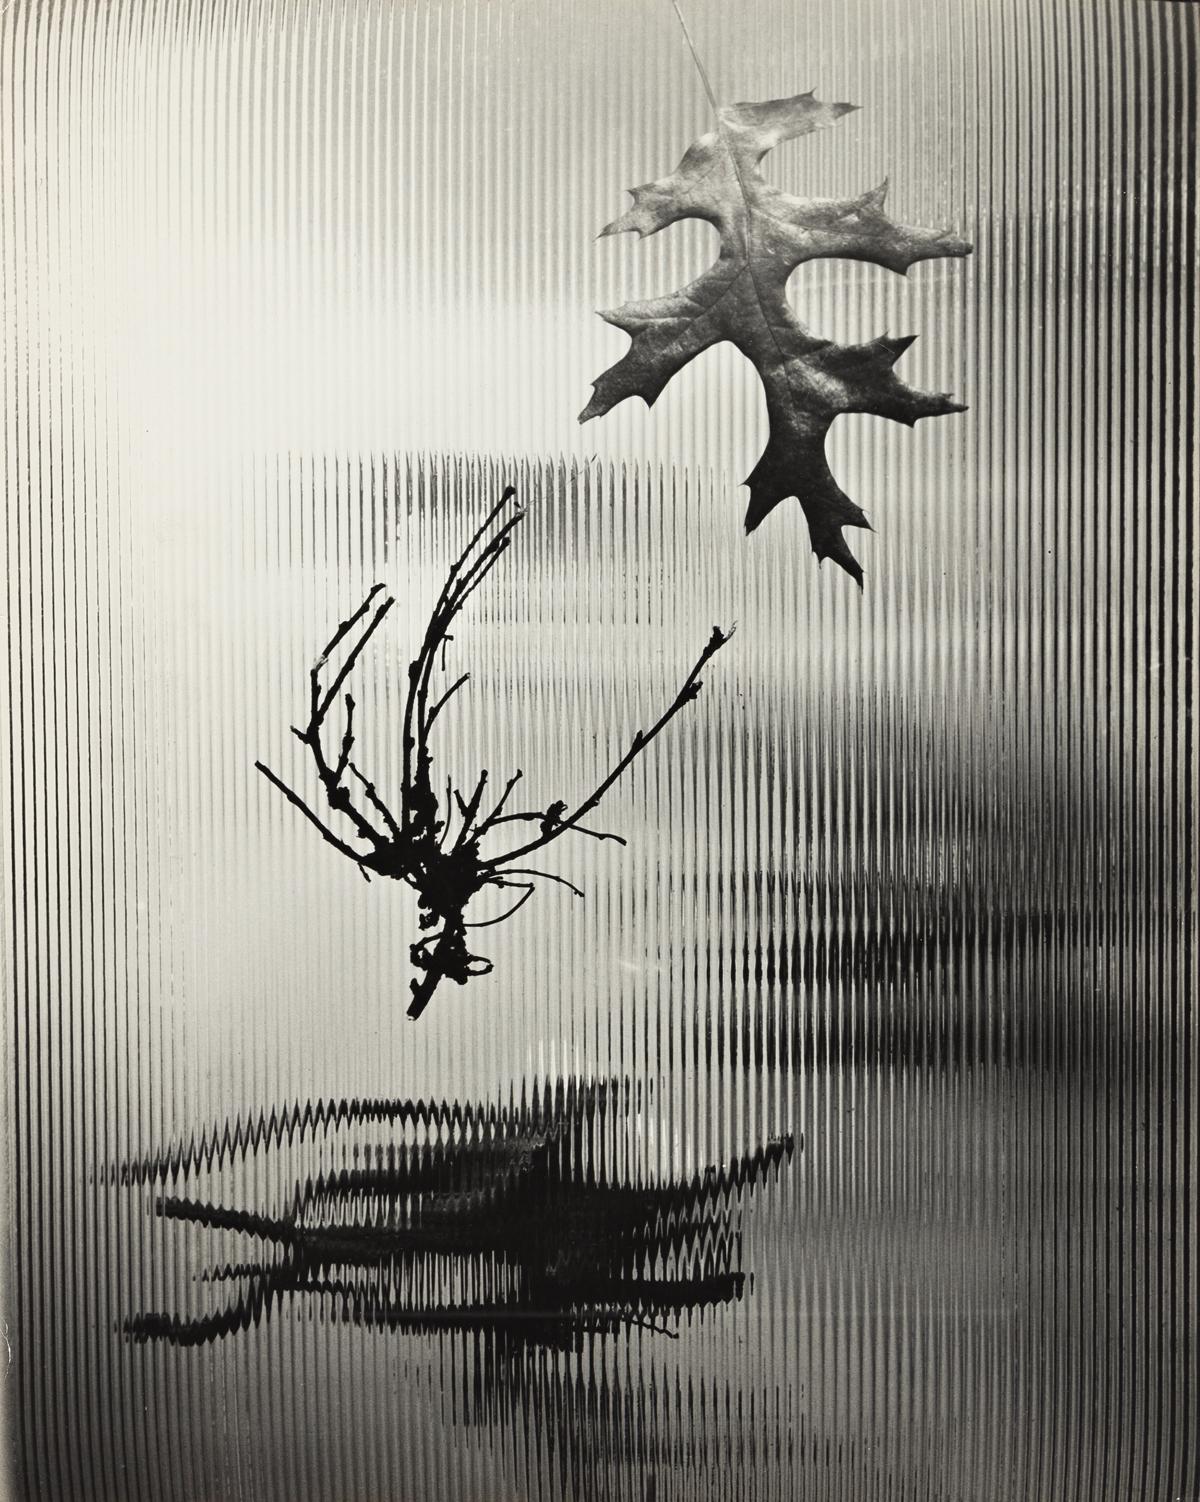 GYÖRGY KEPES (1906-2001) Abstraction.